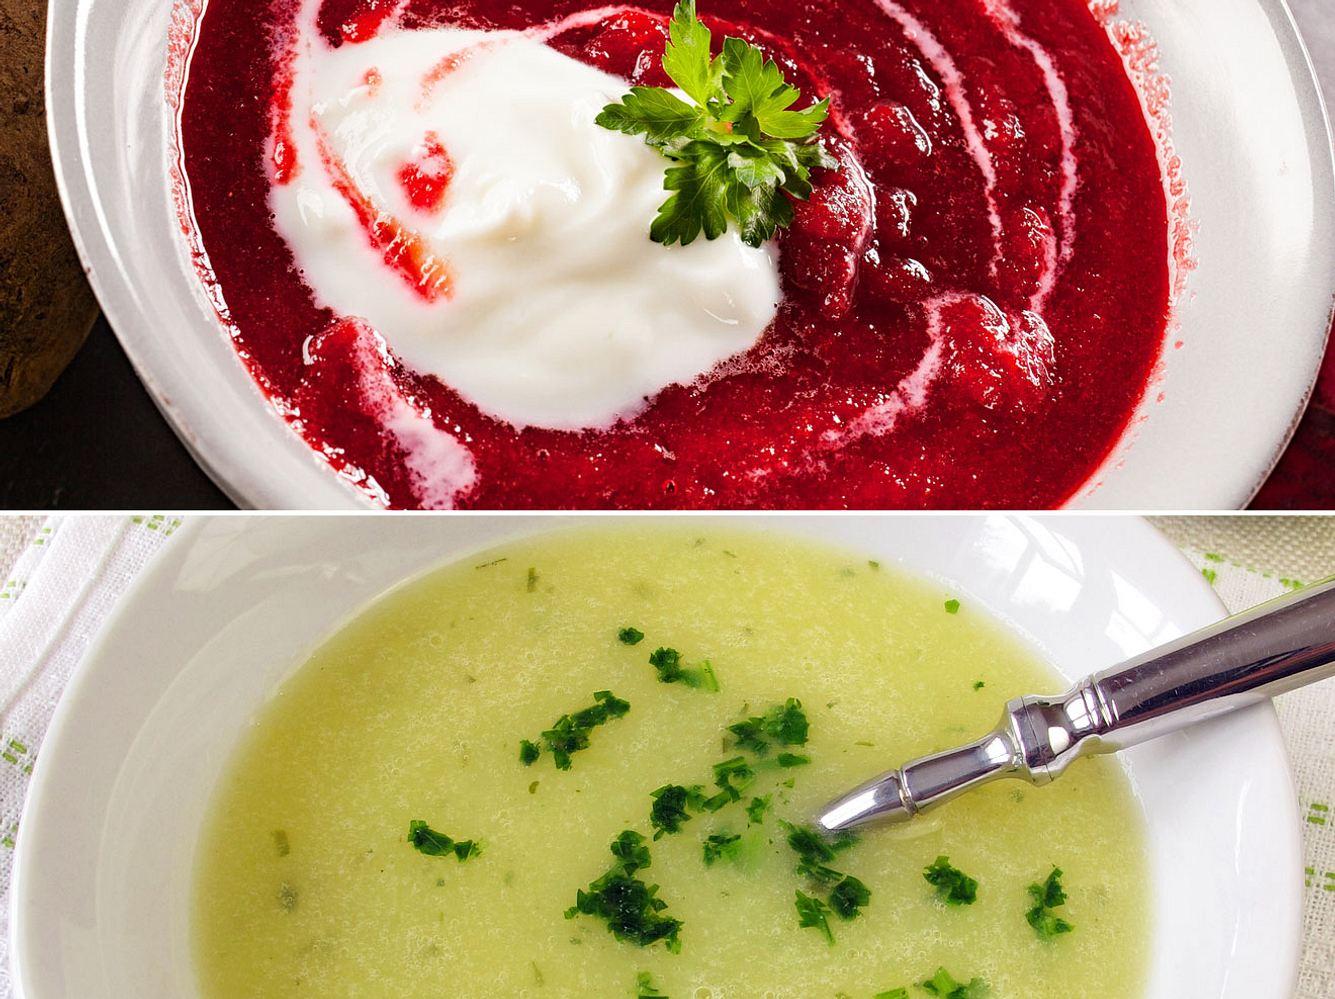 Rote-Bete-Suppe und Kohlrabisuppe.